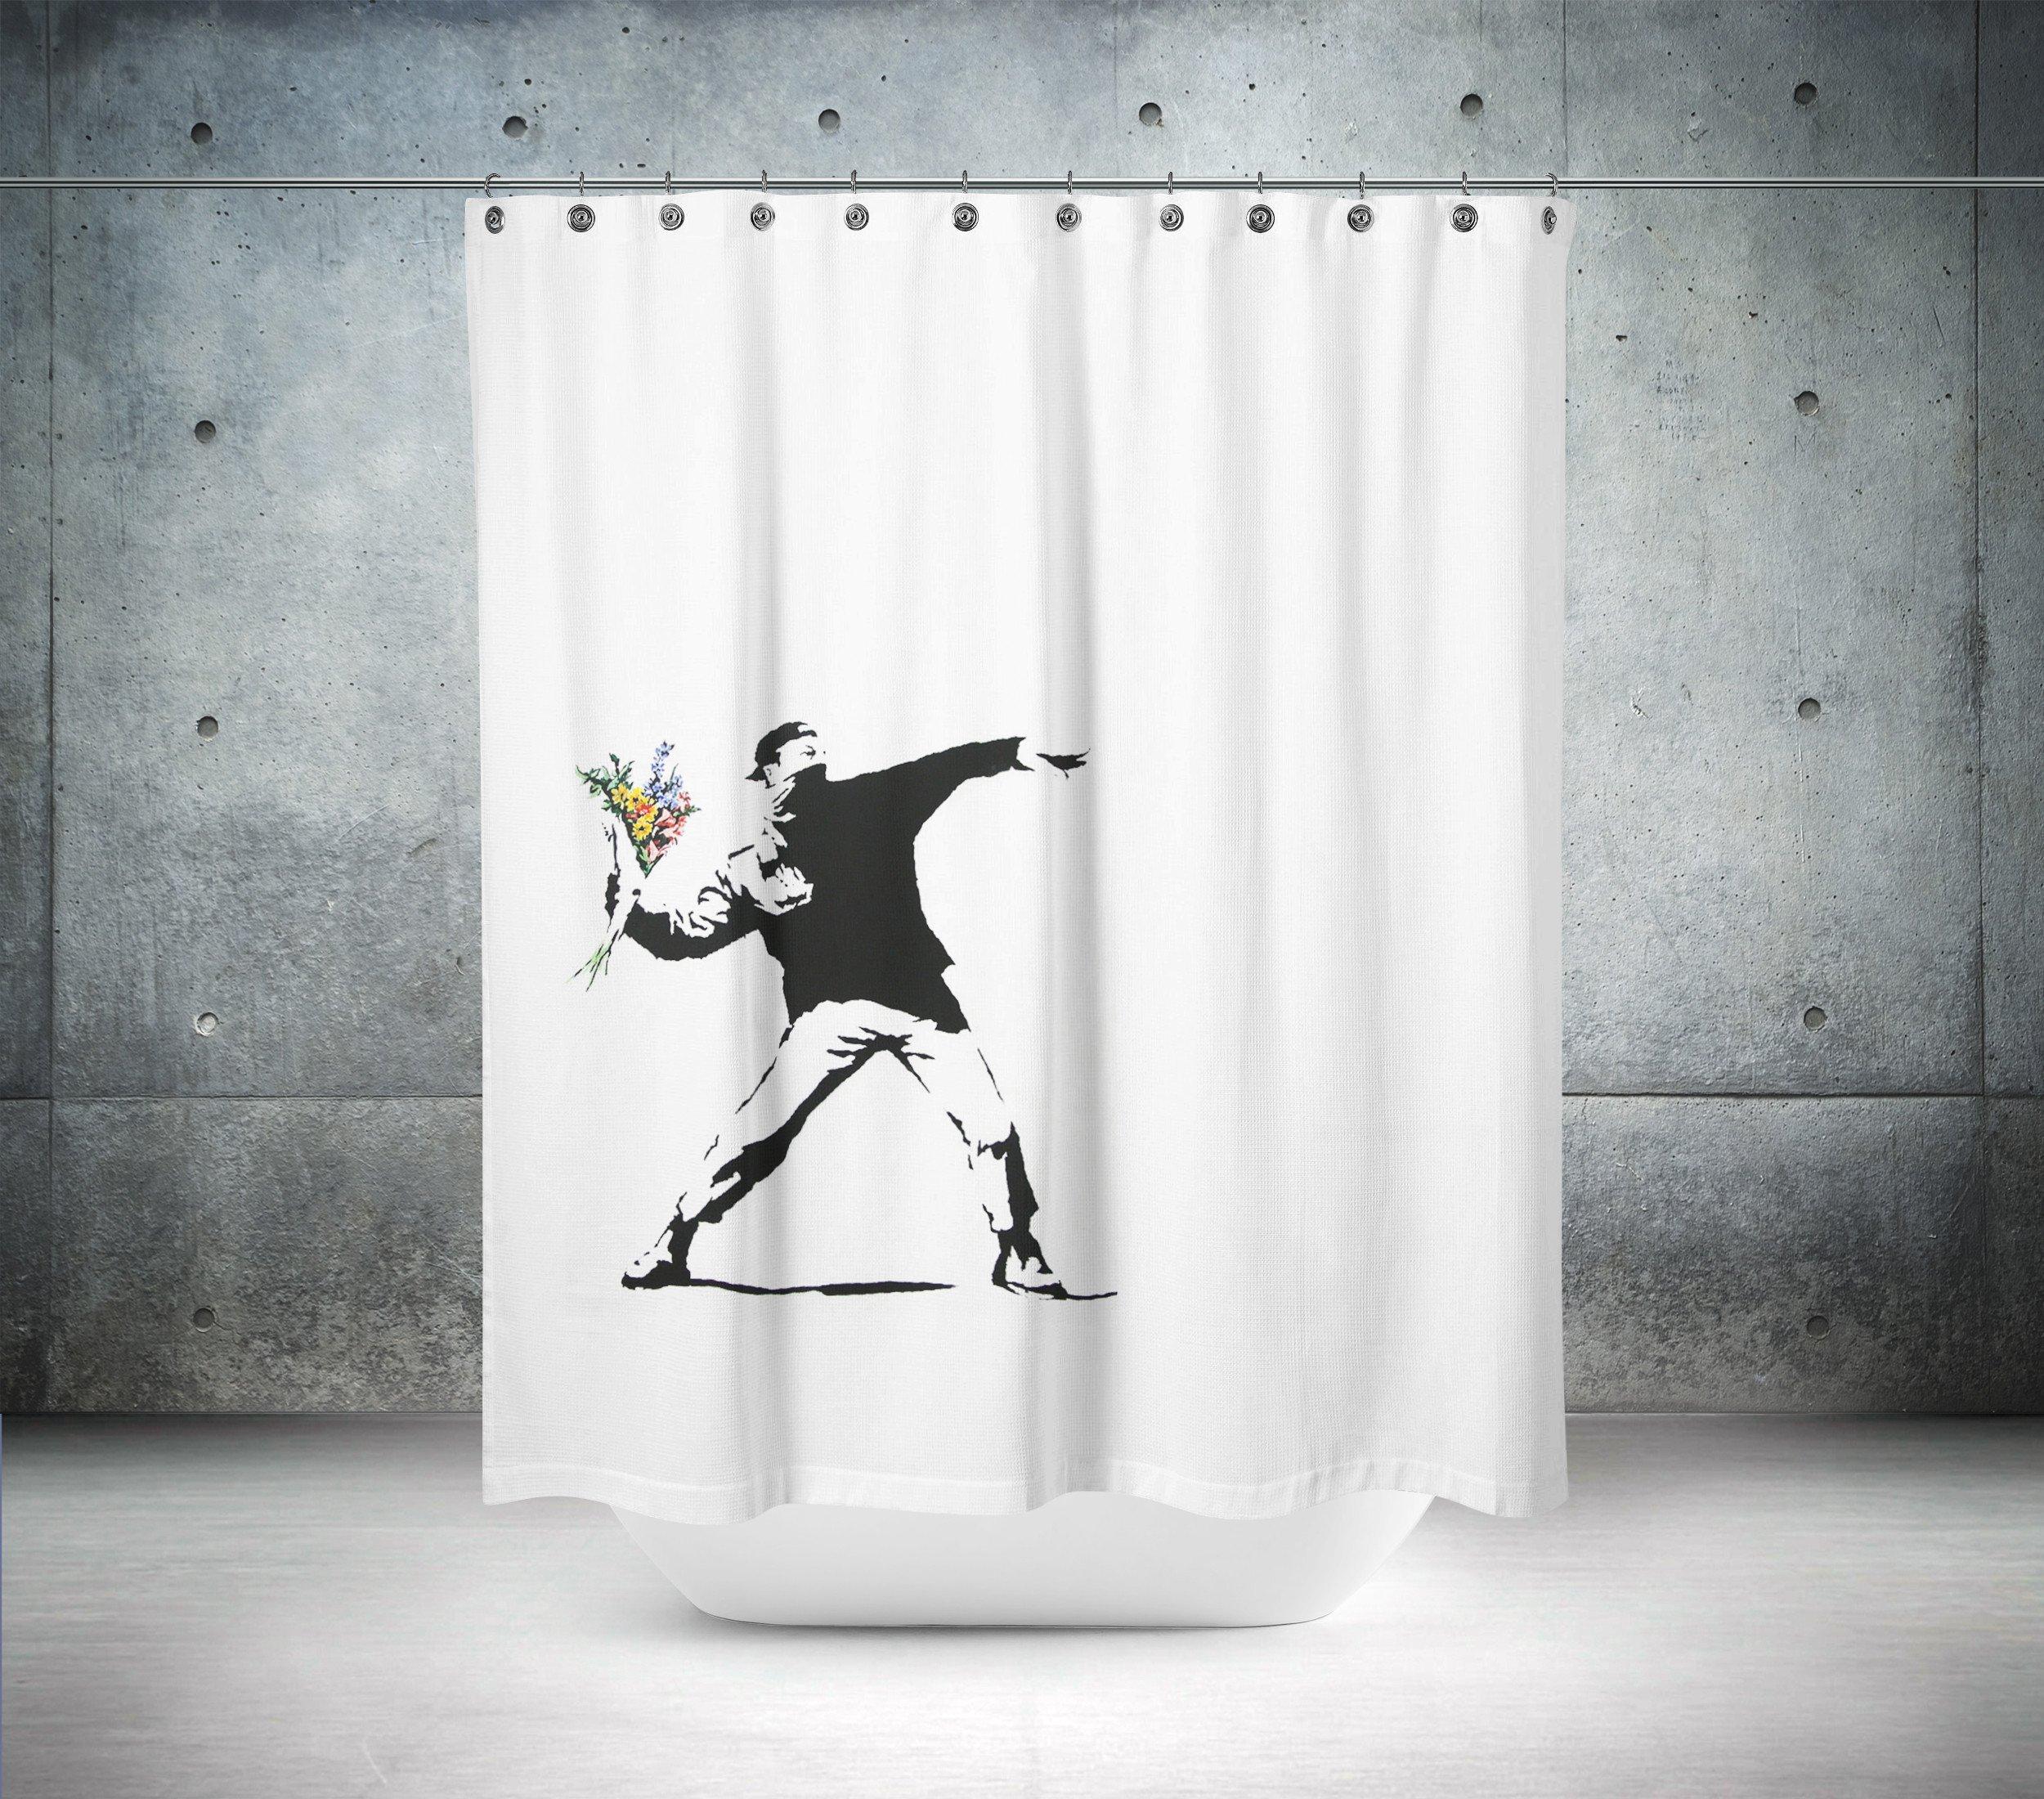 Banksy Flower Chucker In Berlin Shower Curtain Curtains Shower